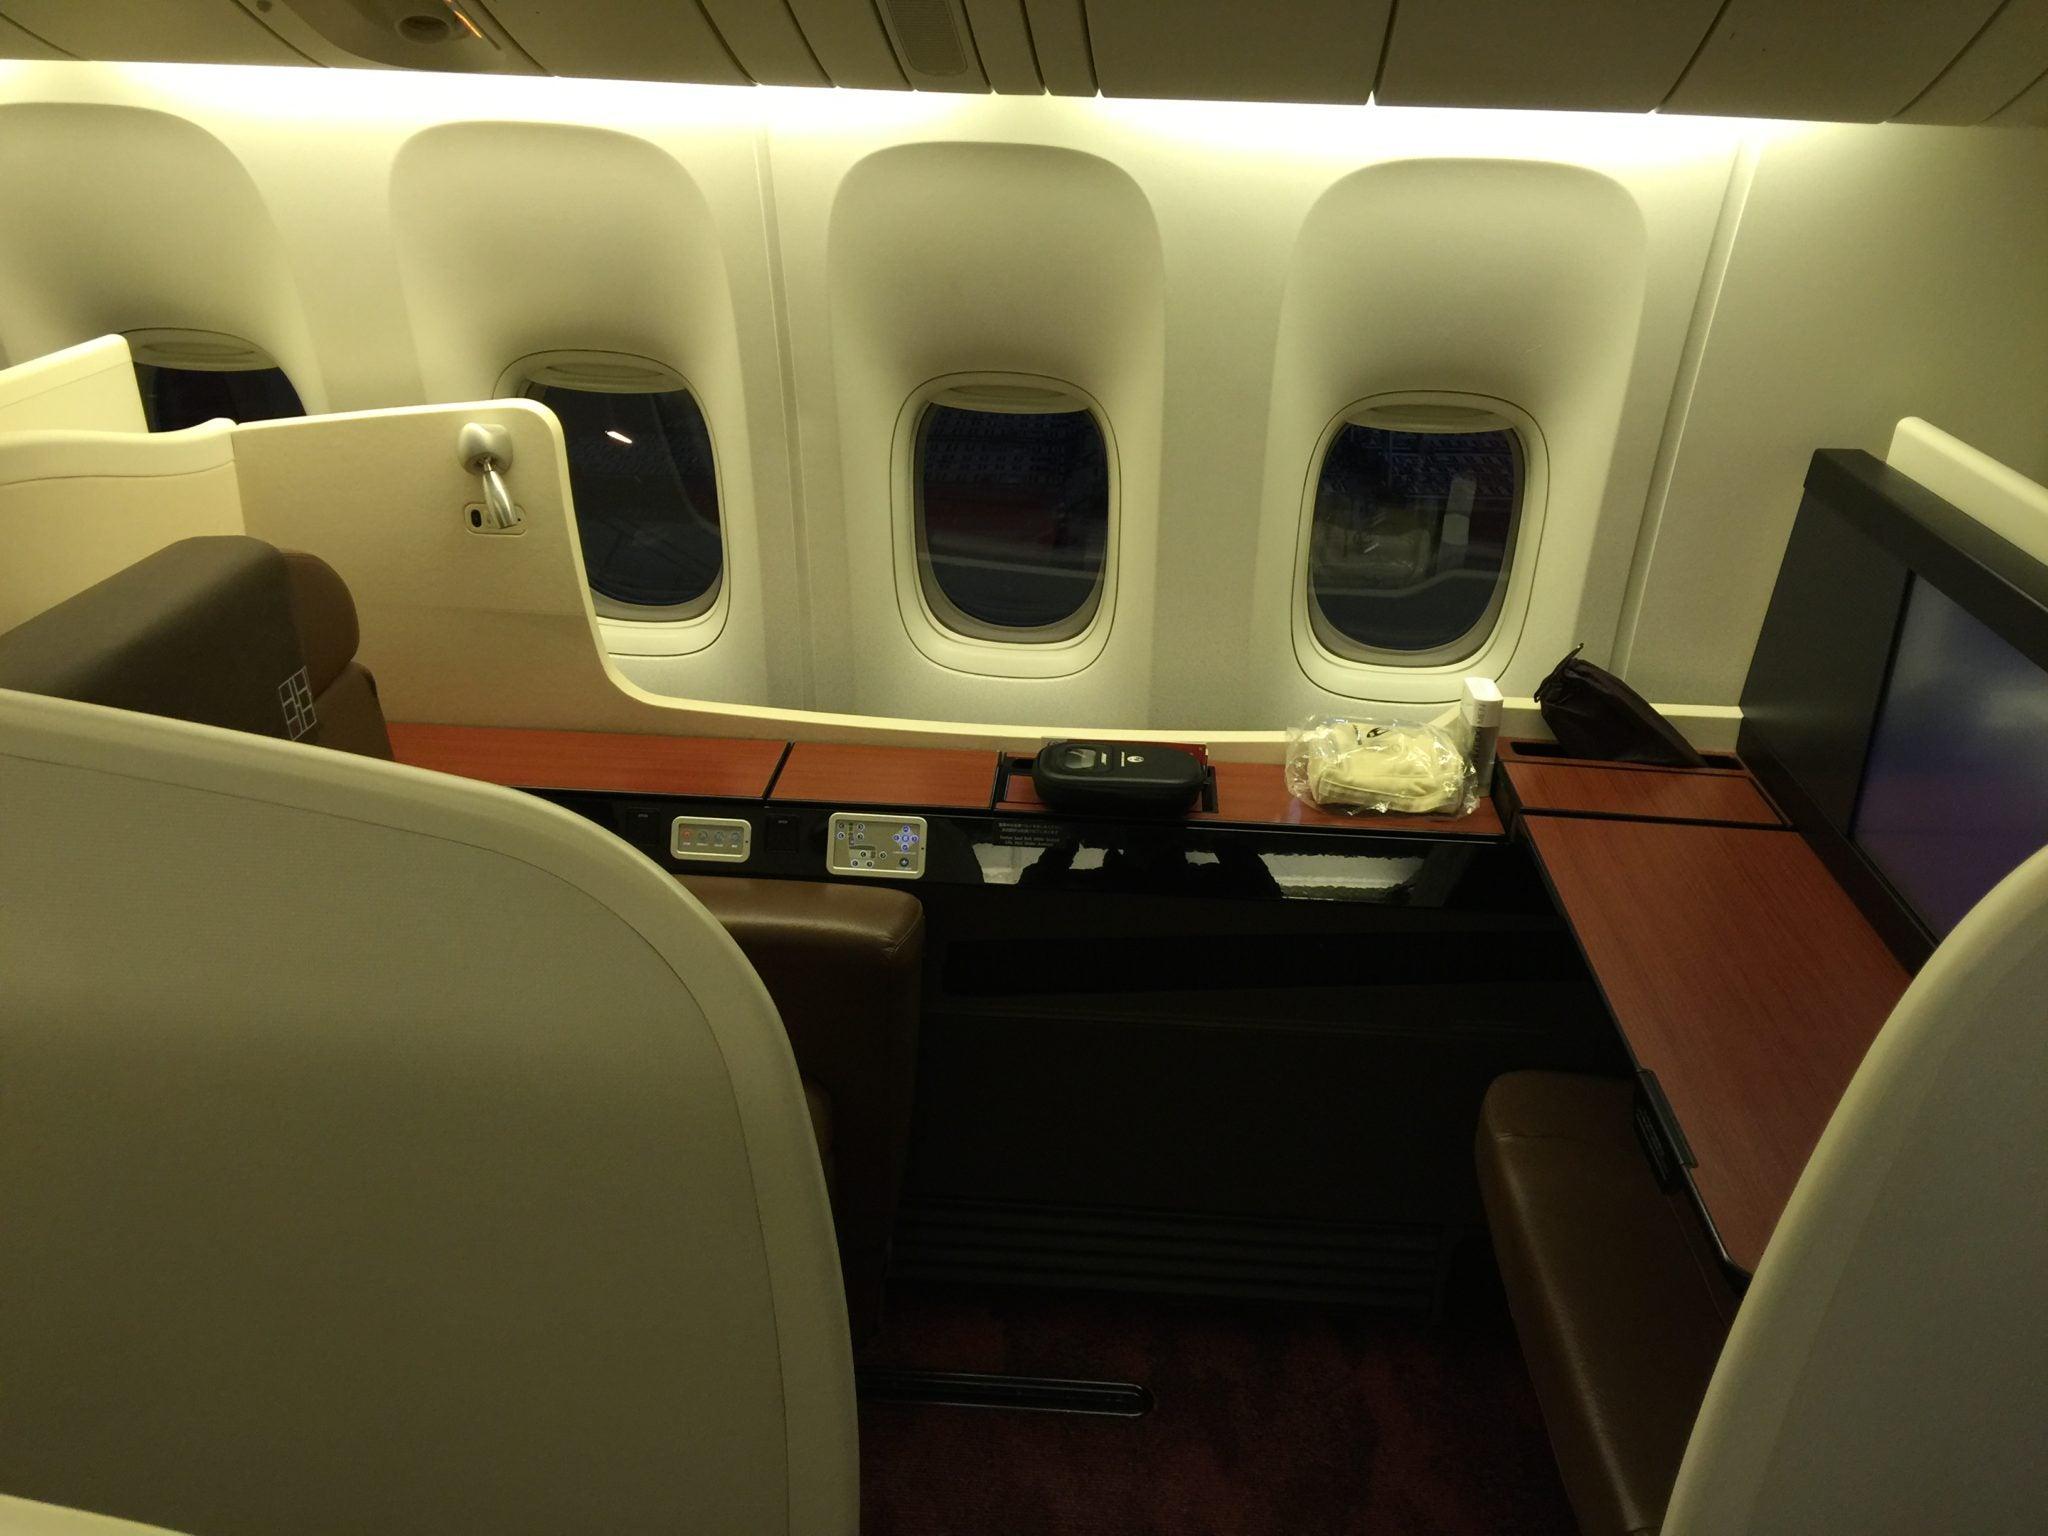 ea168cf0ad2b 37 Best Ways to Redeem British Airways Avios for Max Value  2019